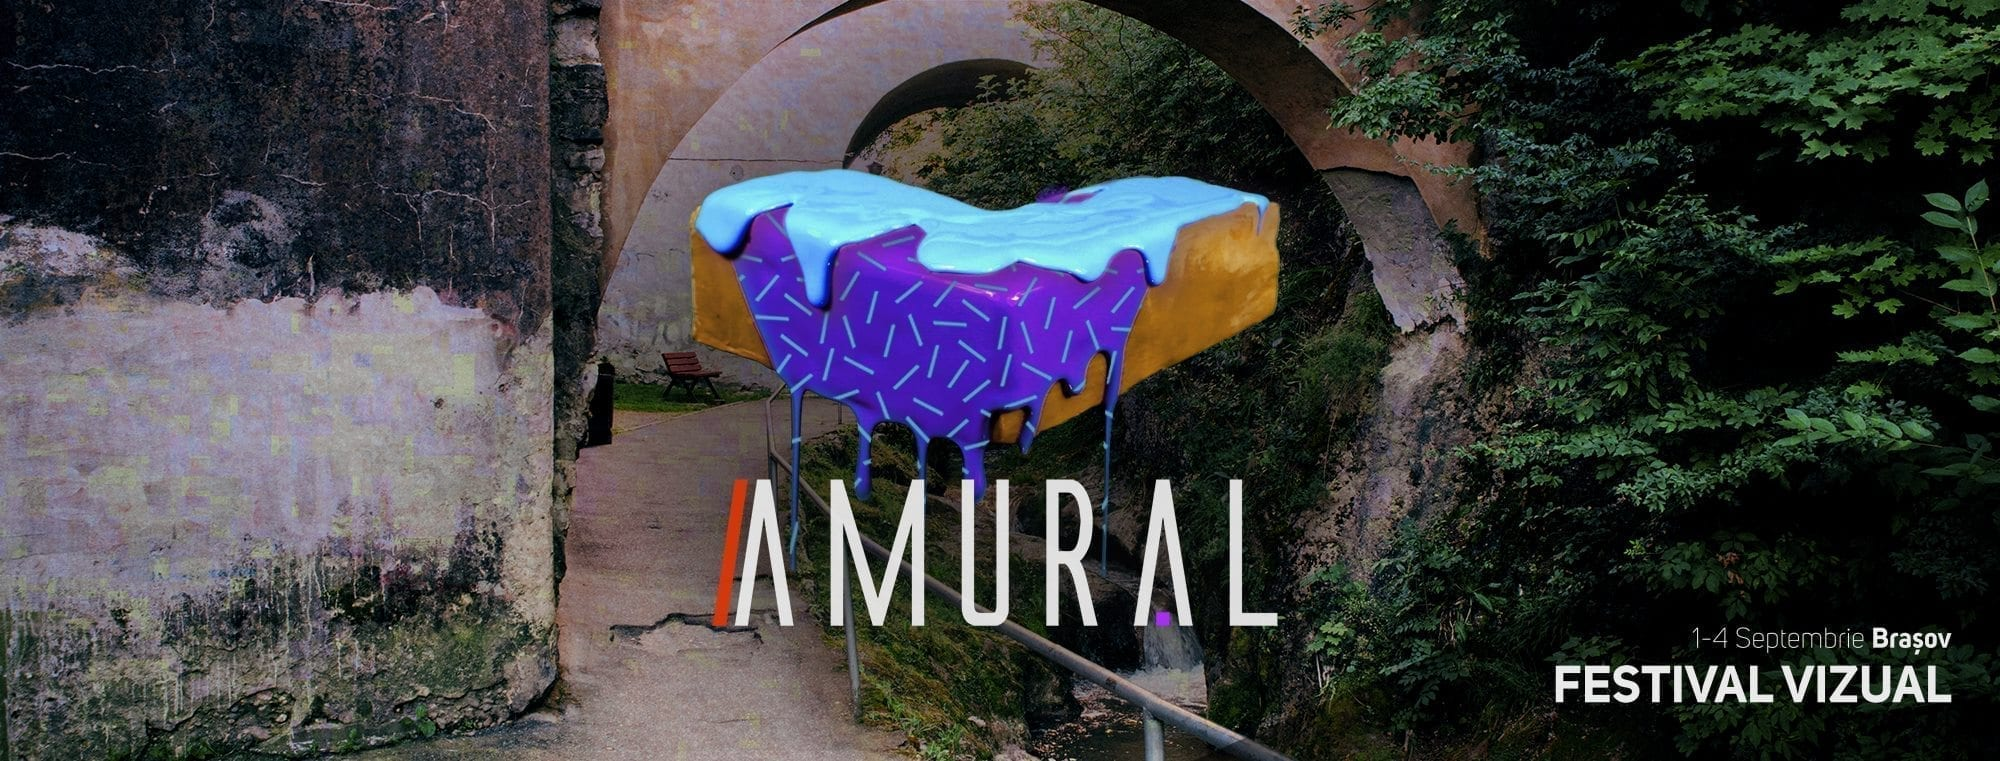 Amural (ii) Festival Vizual @ Dupa ziduri Brașov